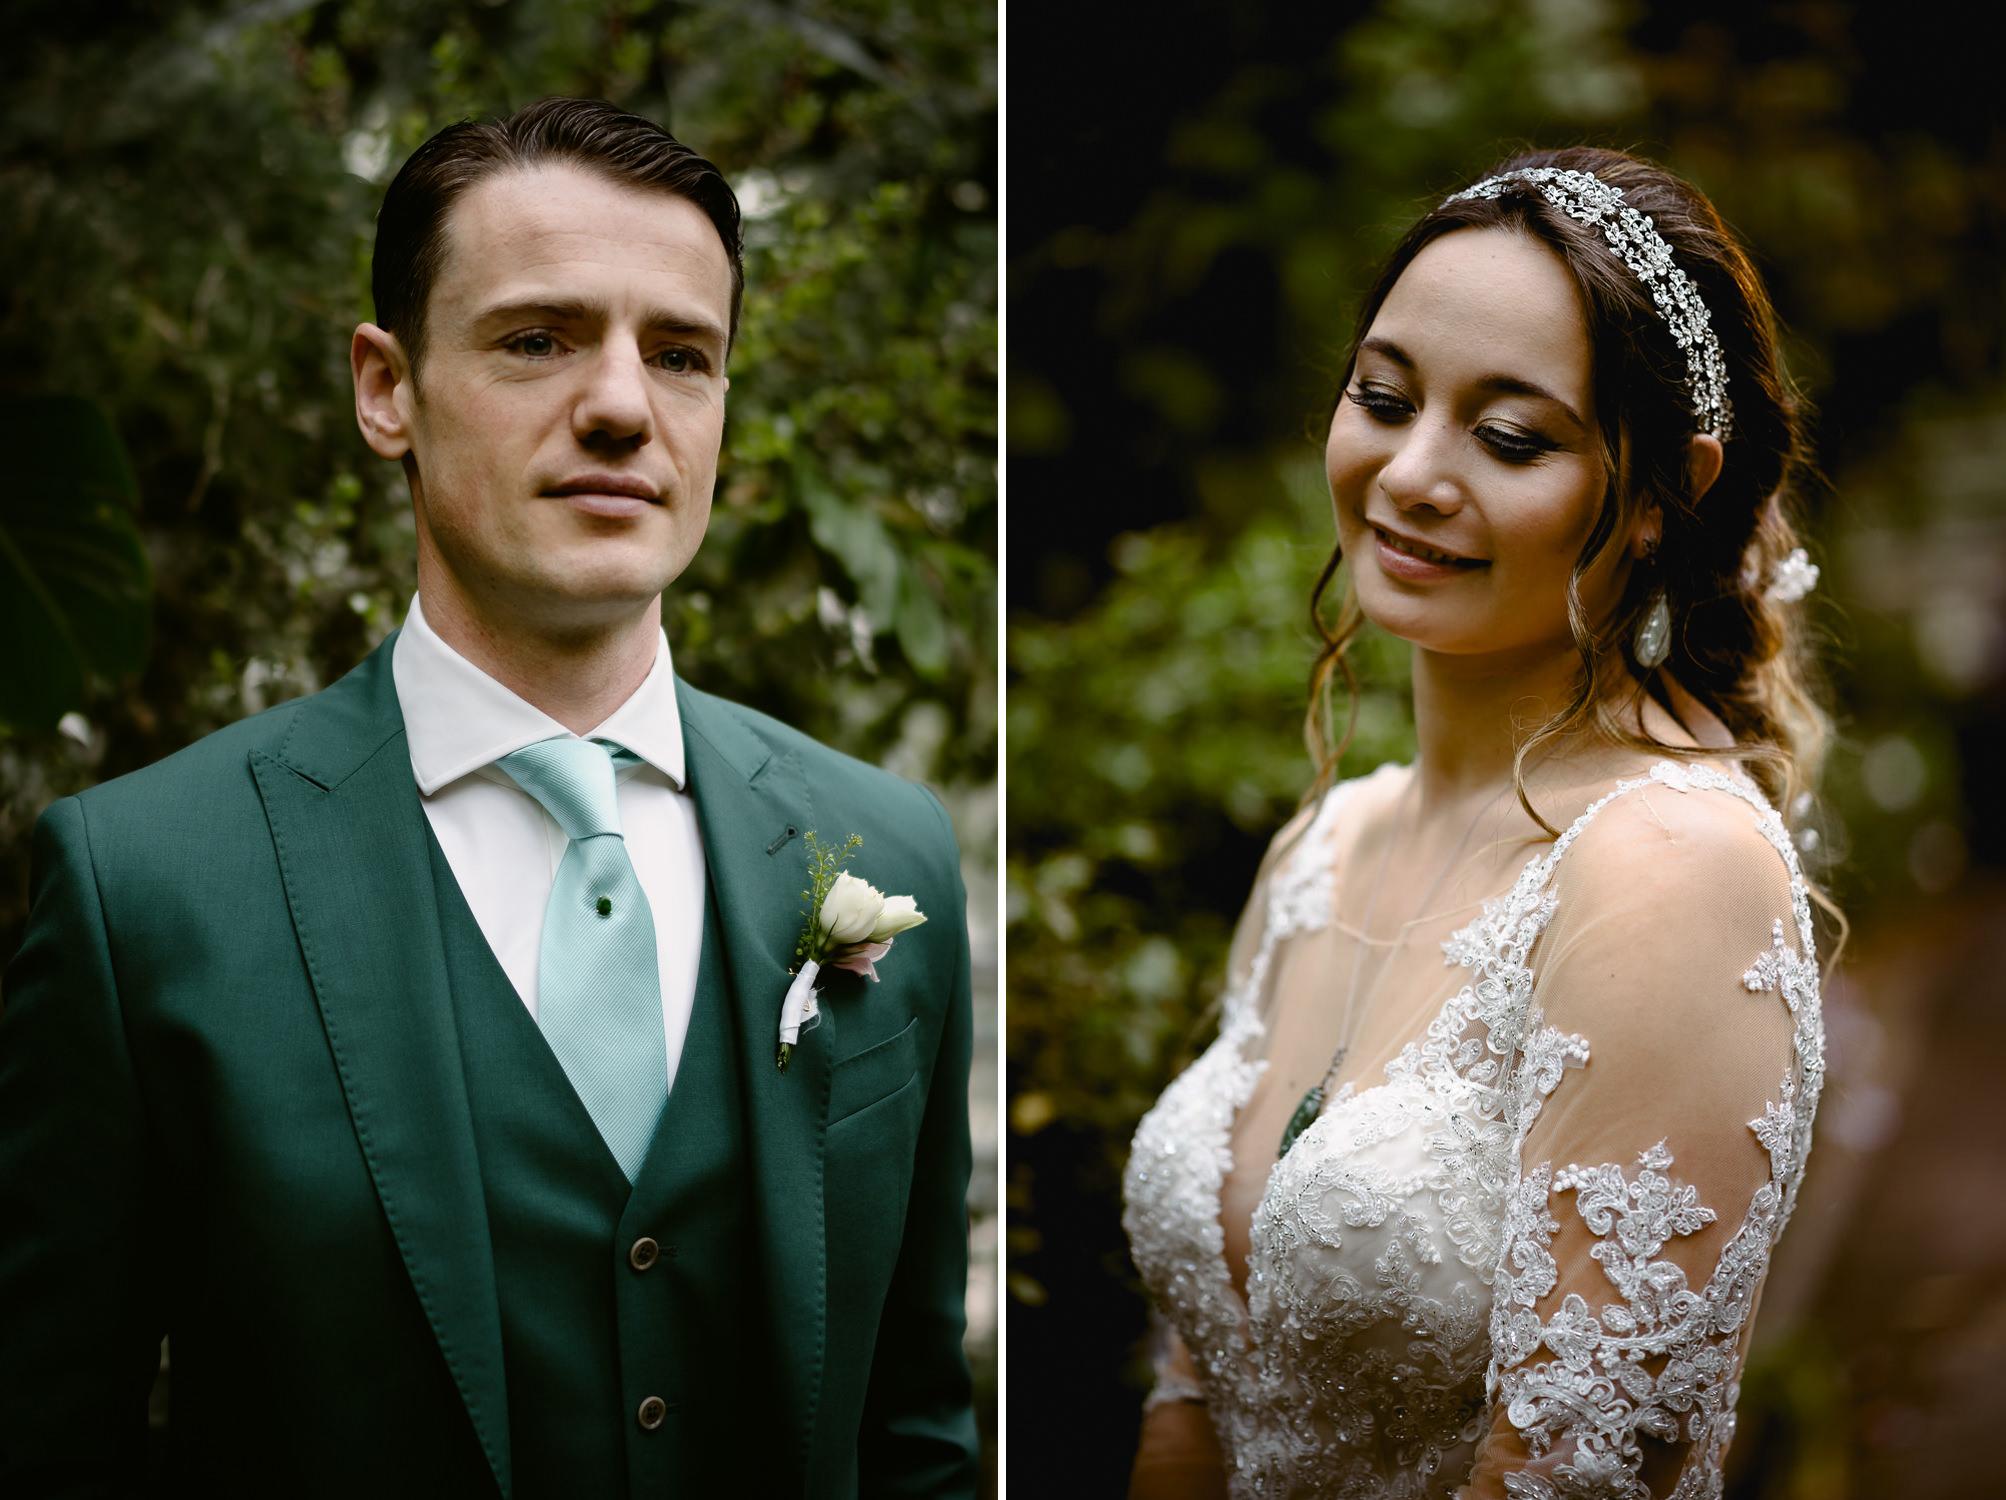 bruidsfotografie-amsterdam-utrecht-trouwfotograaf-mark-hadden-wedding-photography-Robin & Guus-030-3 copy.jpg